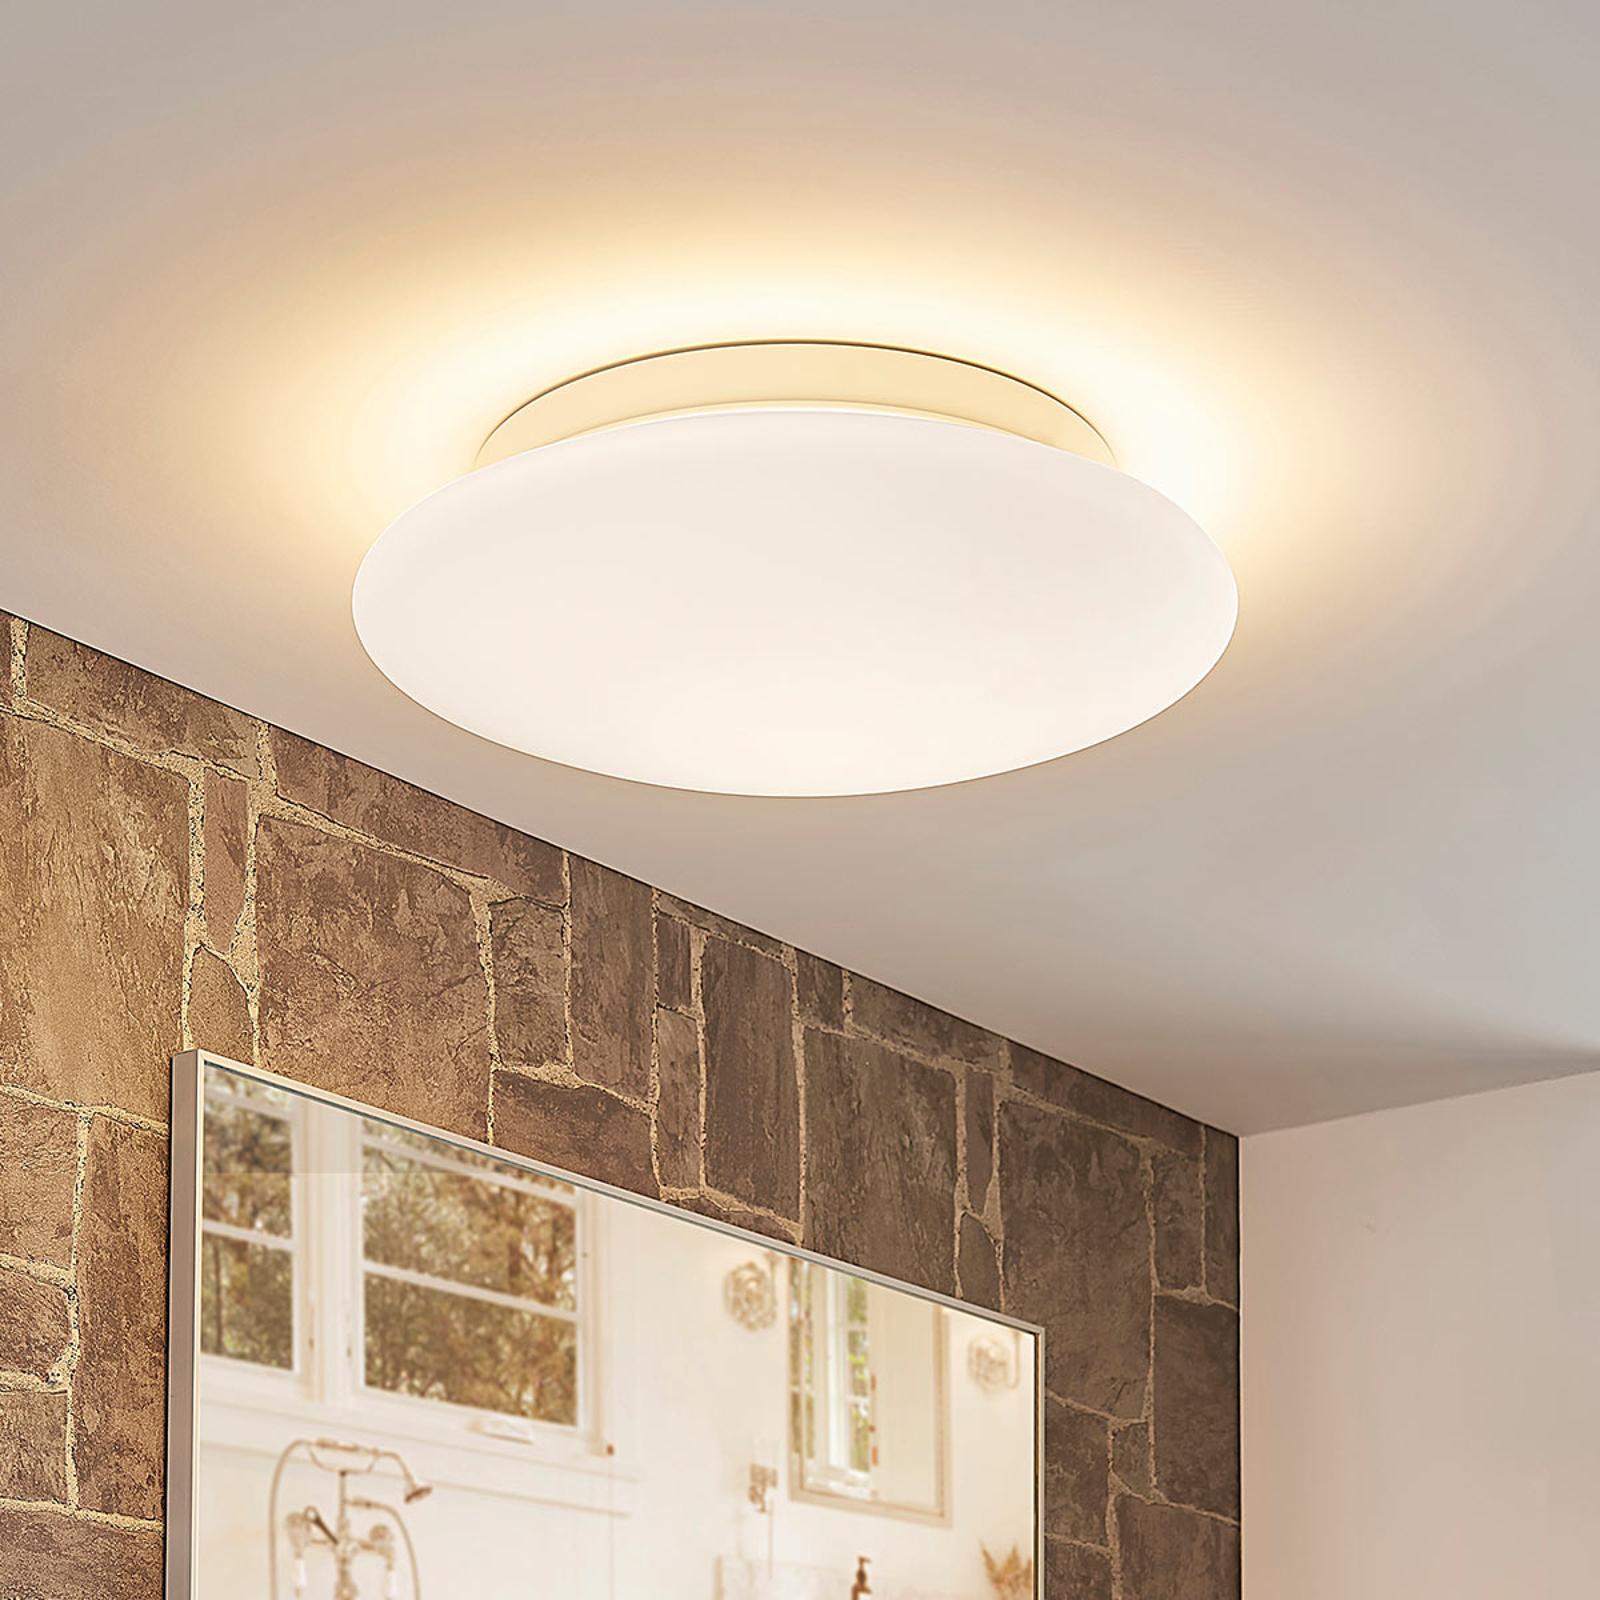 Toan – biała, szklana lampa sufitowa LED, IP44